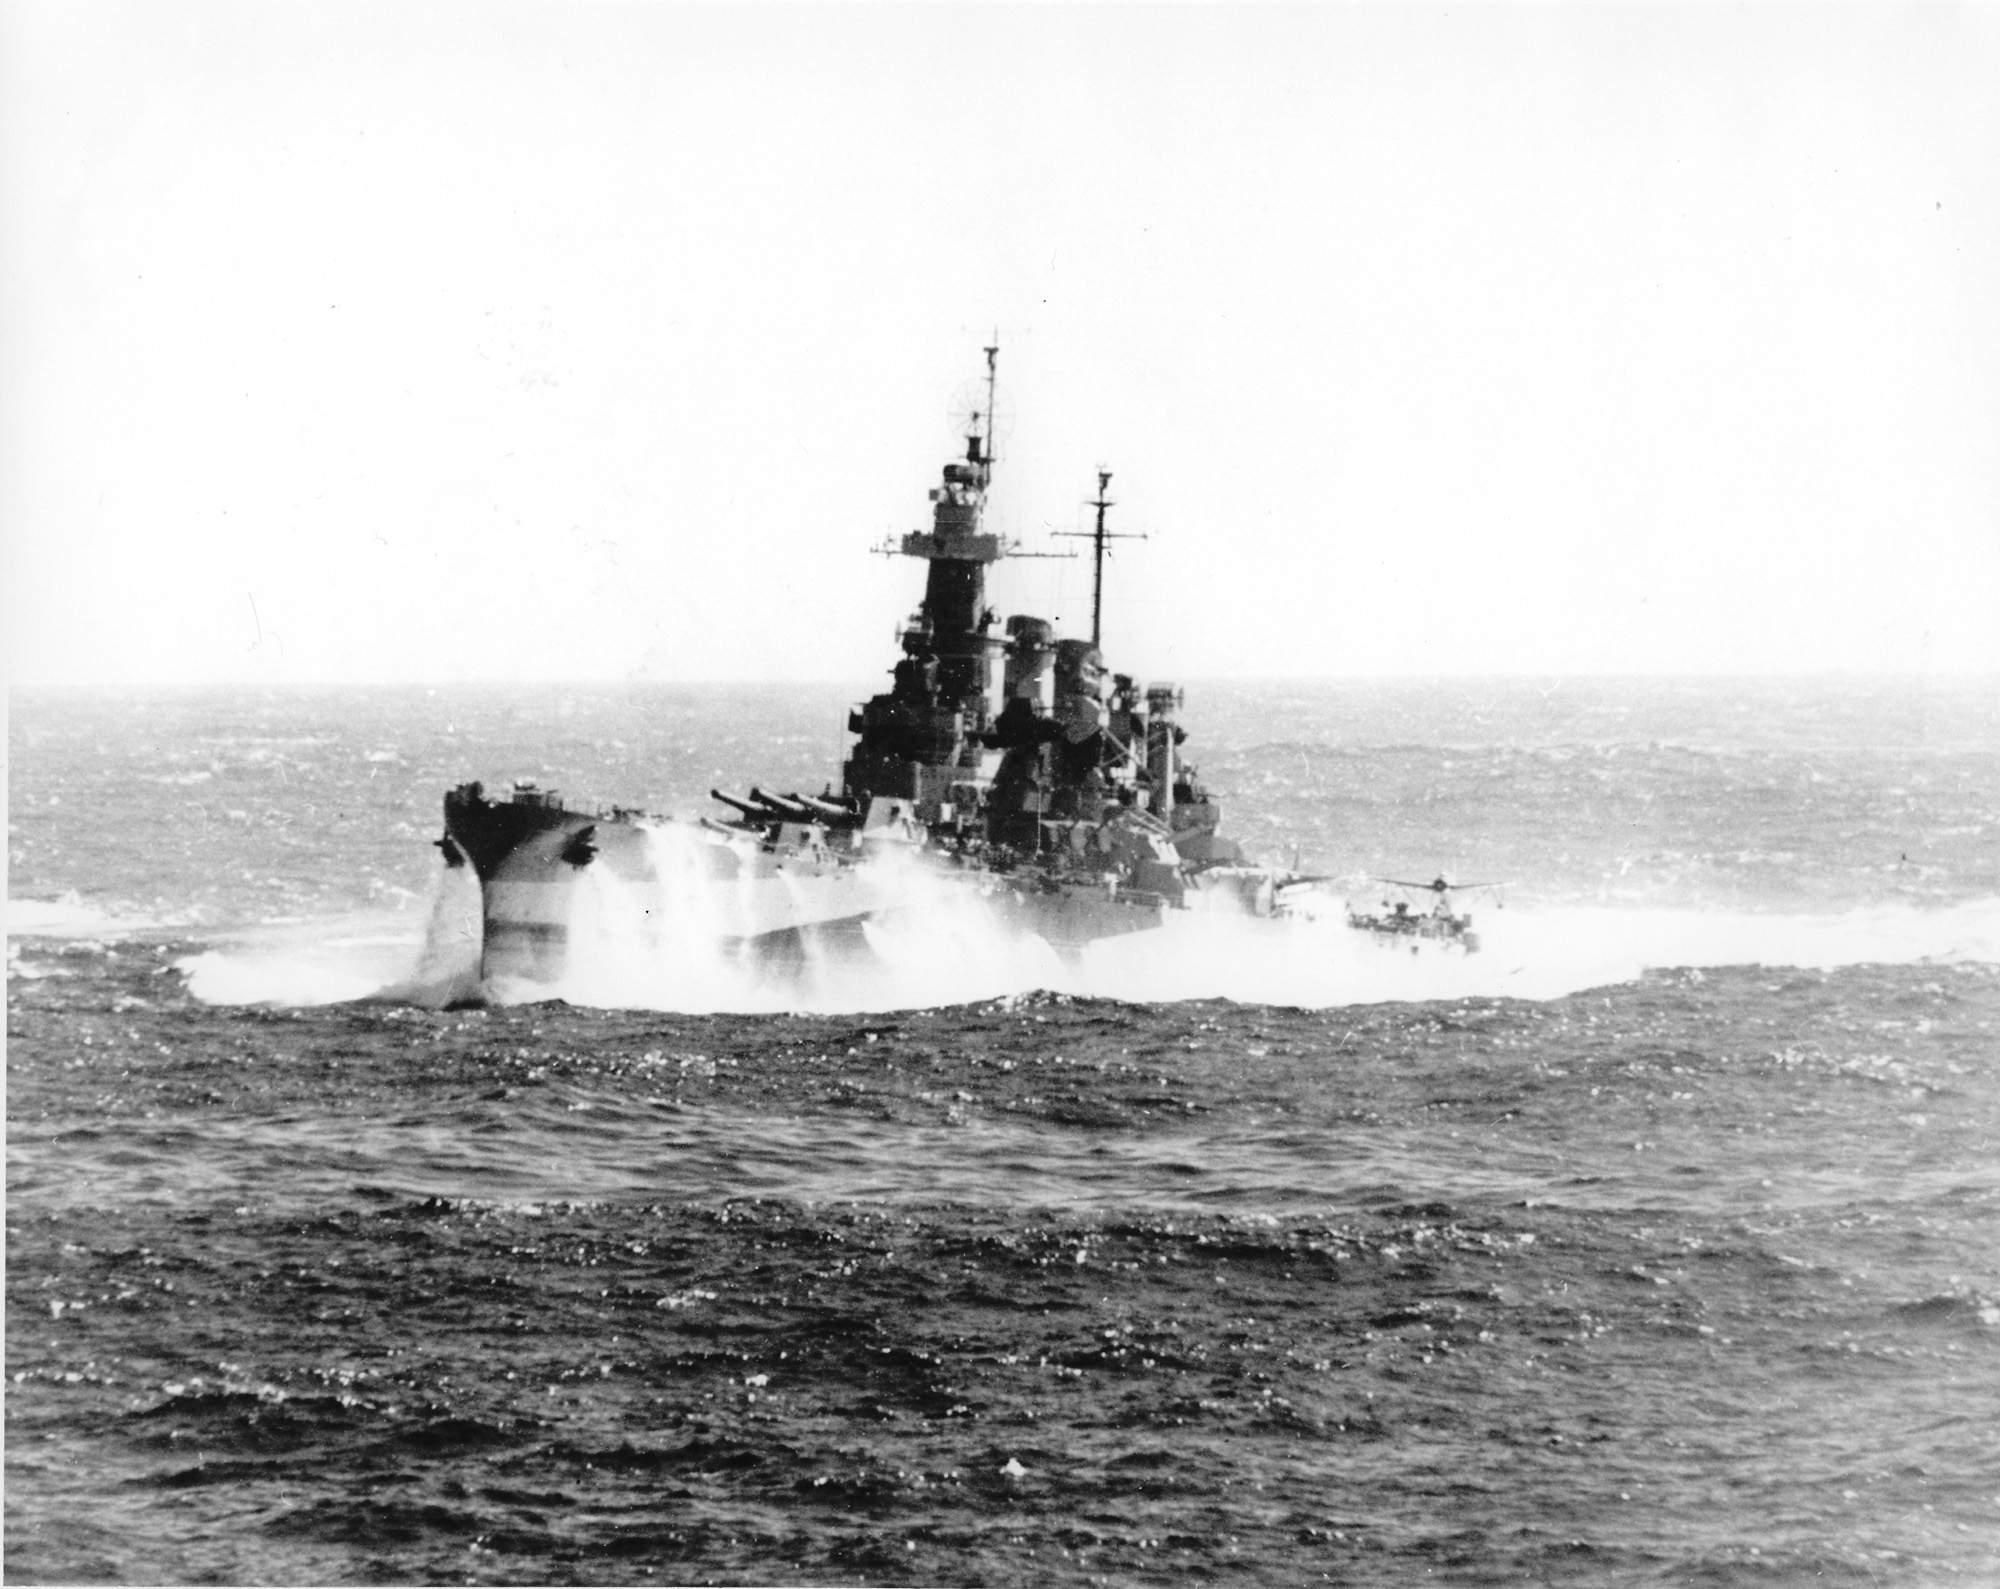 The Battleship Uss North Carolina Battles Heavy Seas In